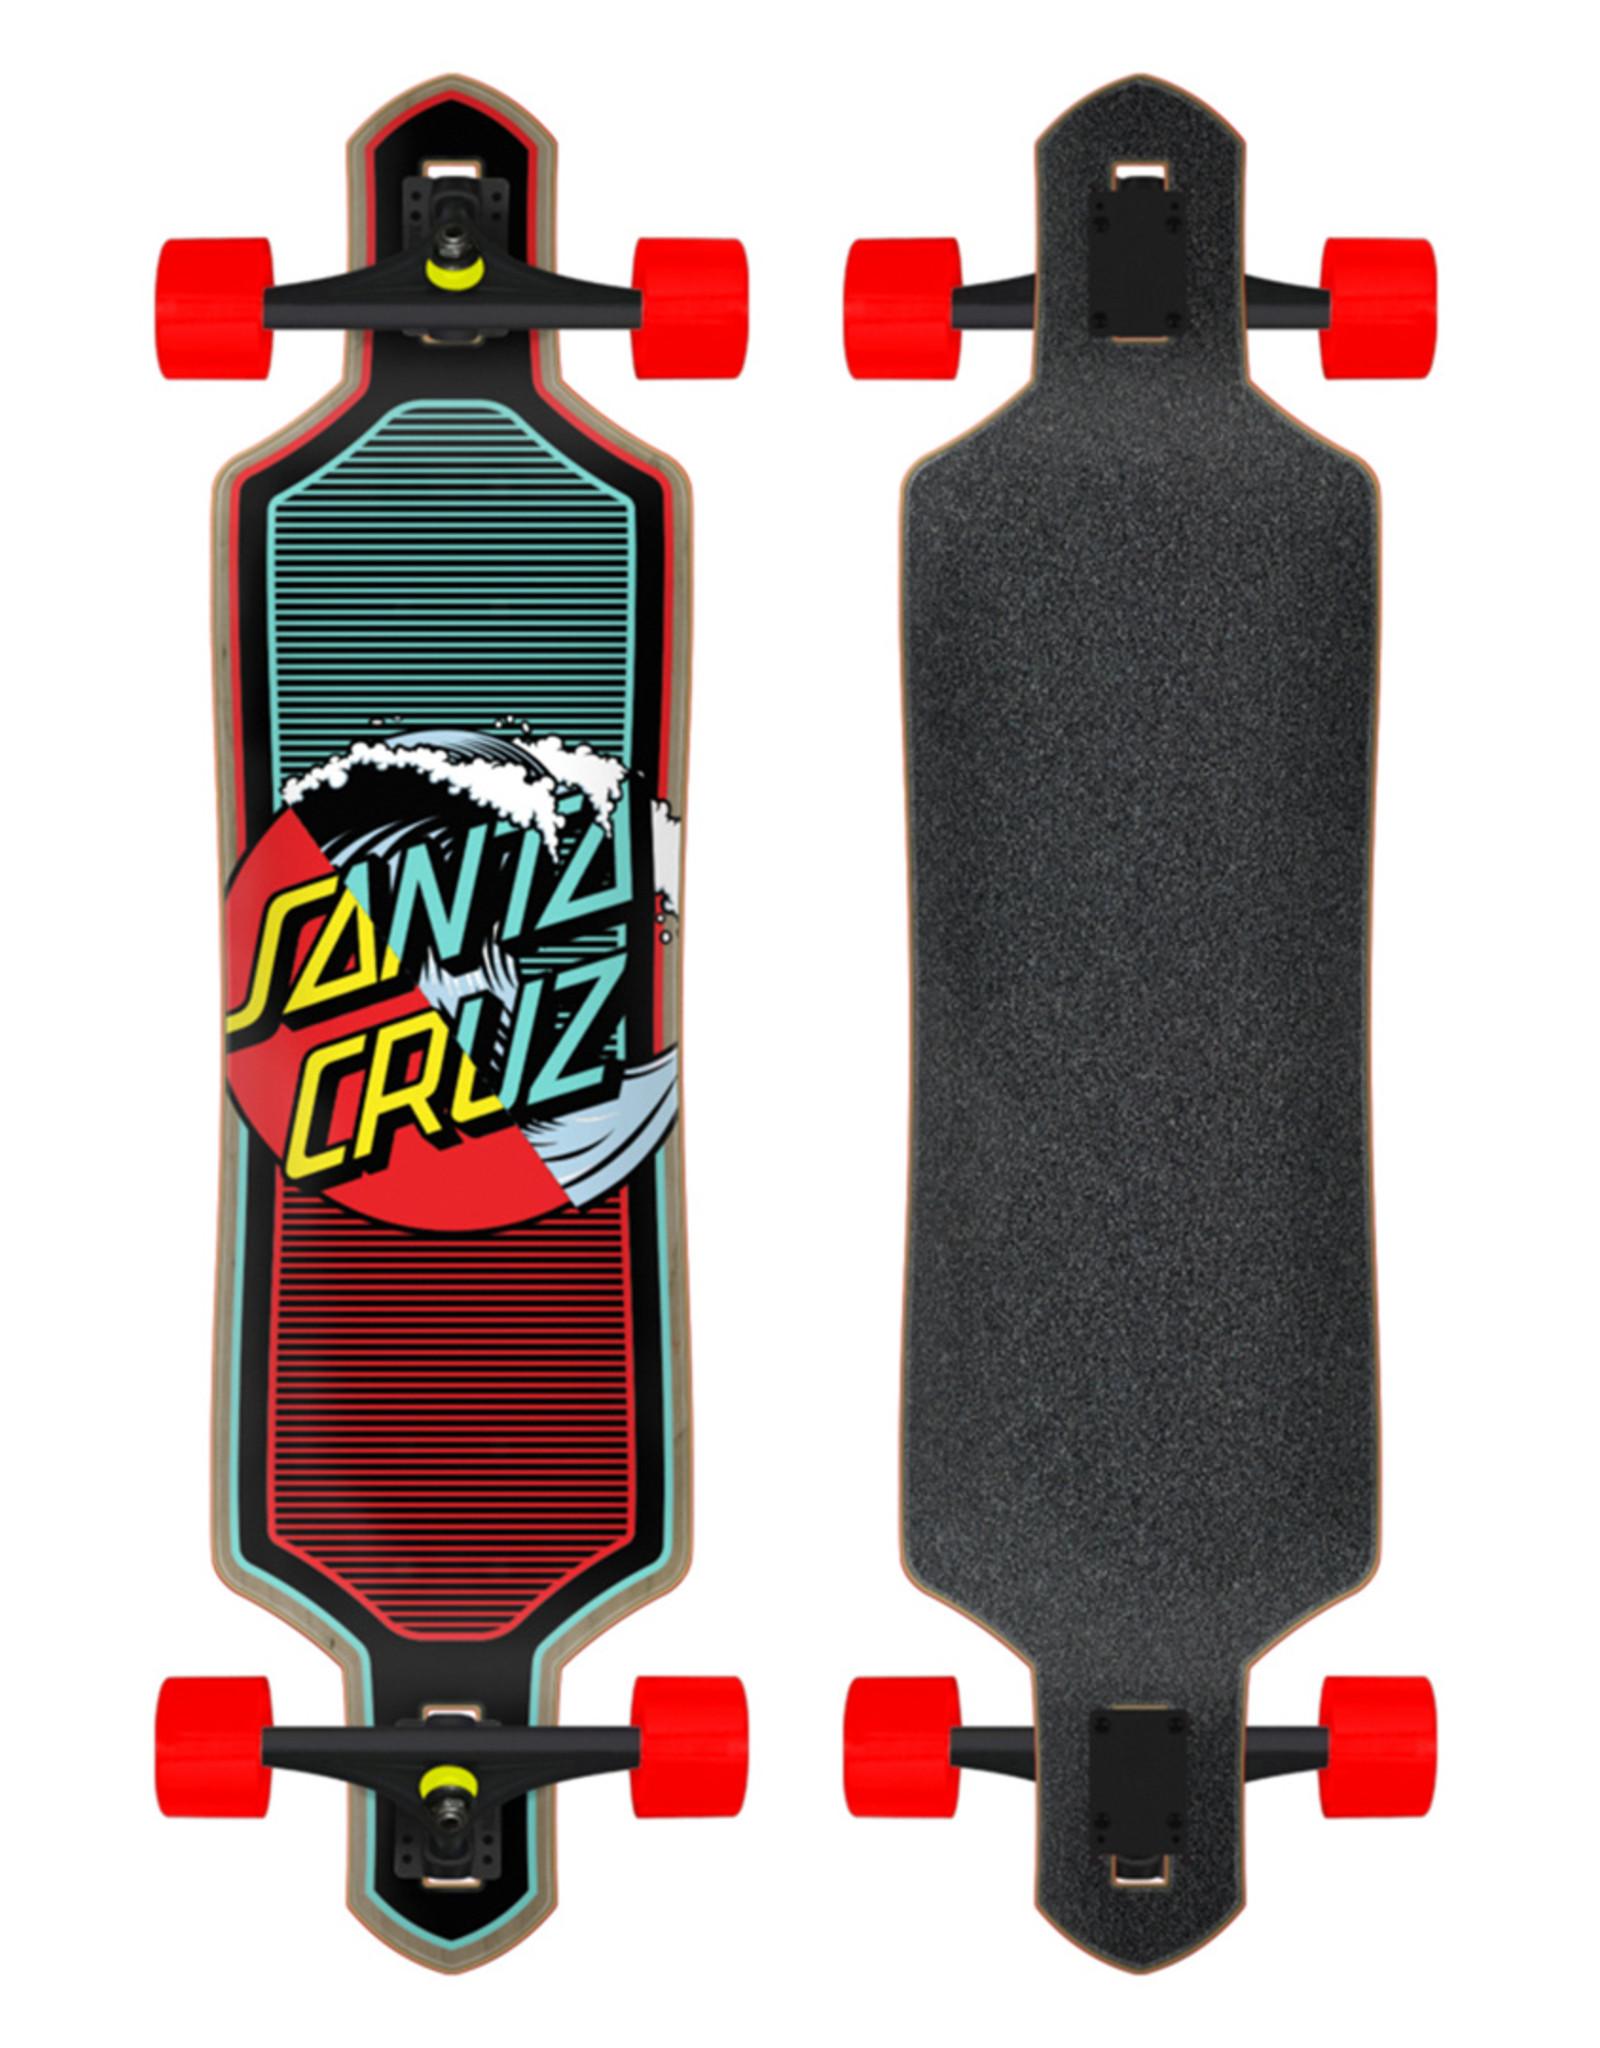 Santa Cruz CRUZ DROP THRU WAVE DOT SPLICE 9x36